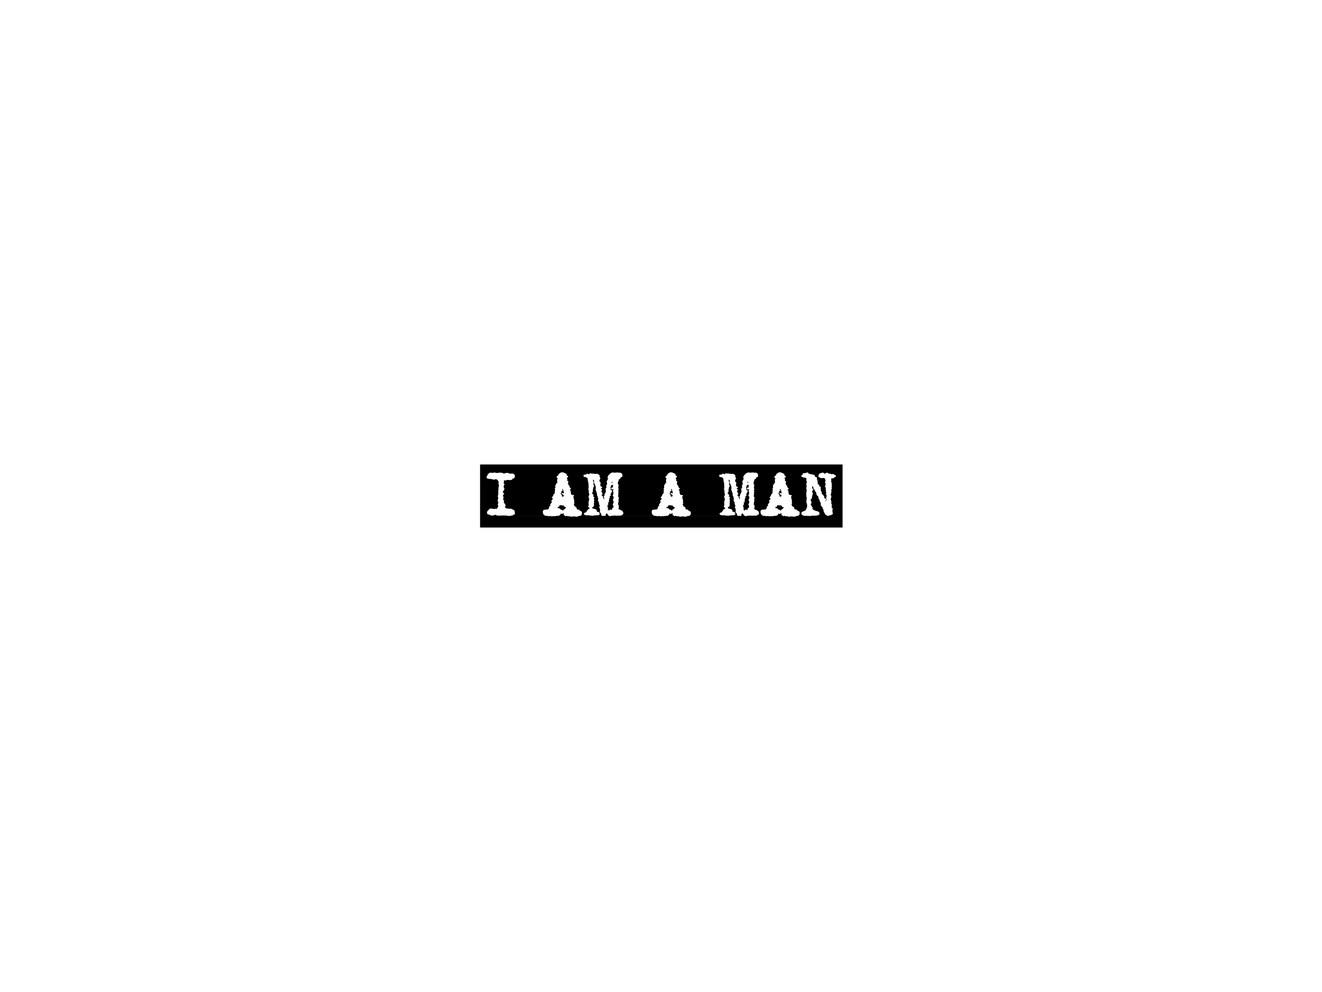 I_AM_A_MAN.jpg